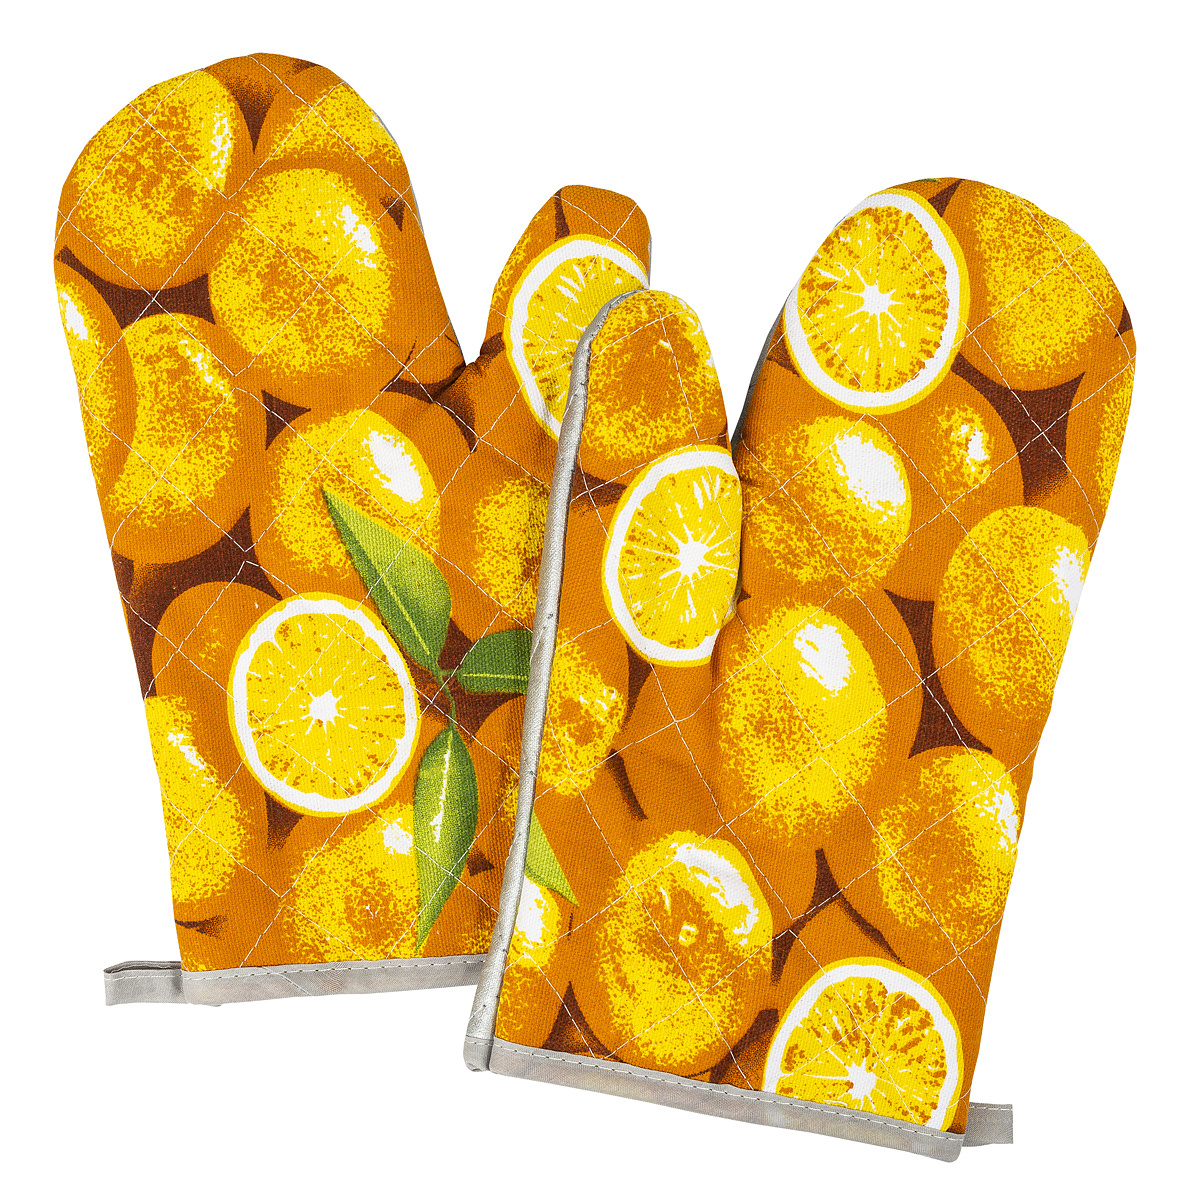 Jahu Chňapka Pomeranč, sada 2 ks, 28 x 18 cm